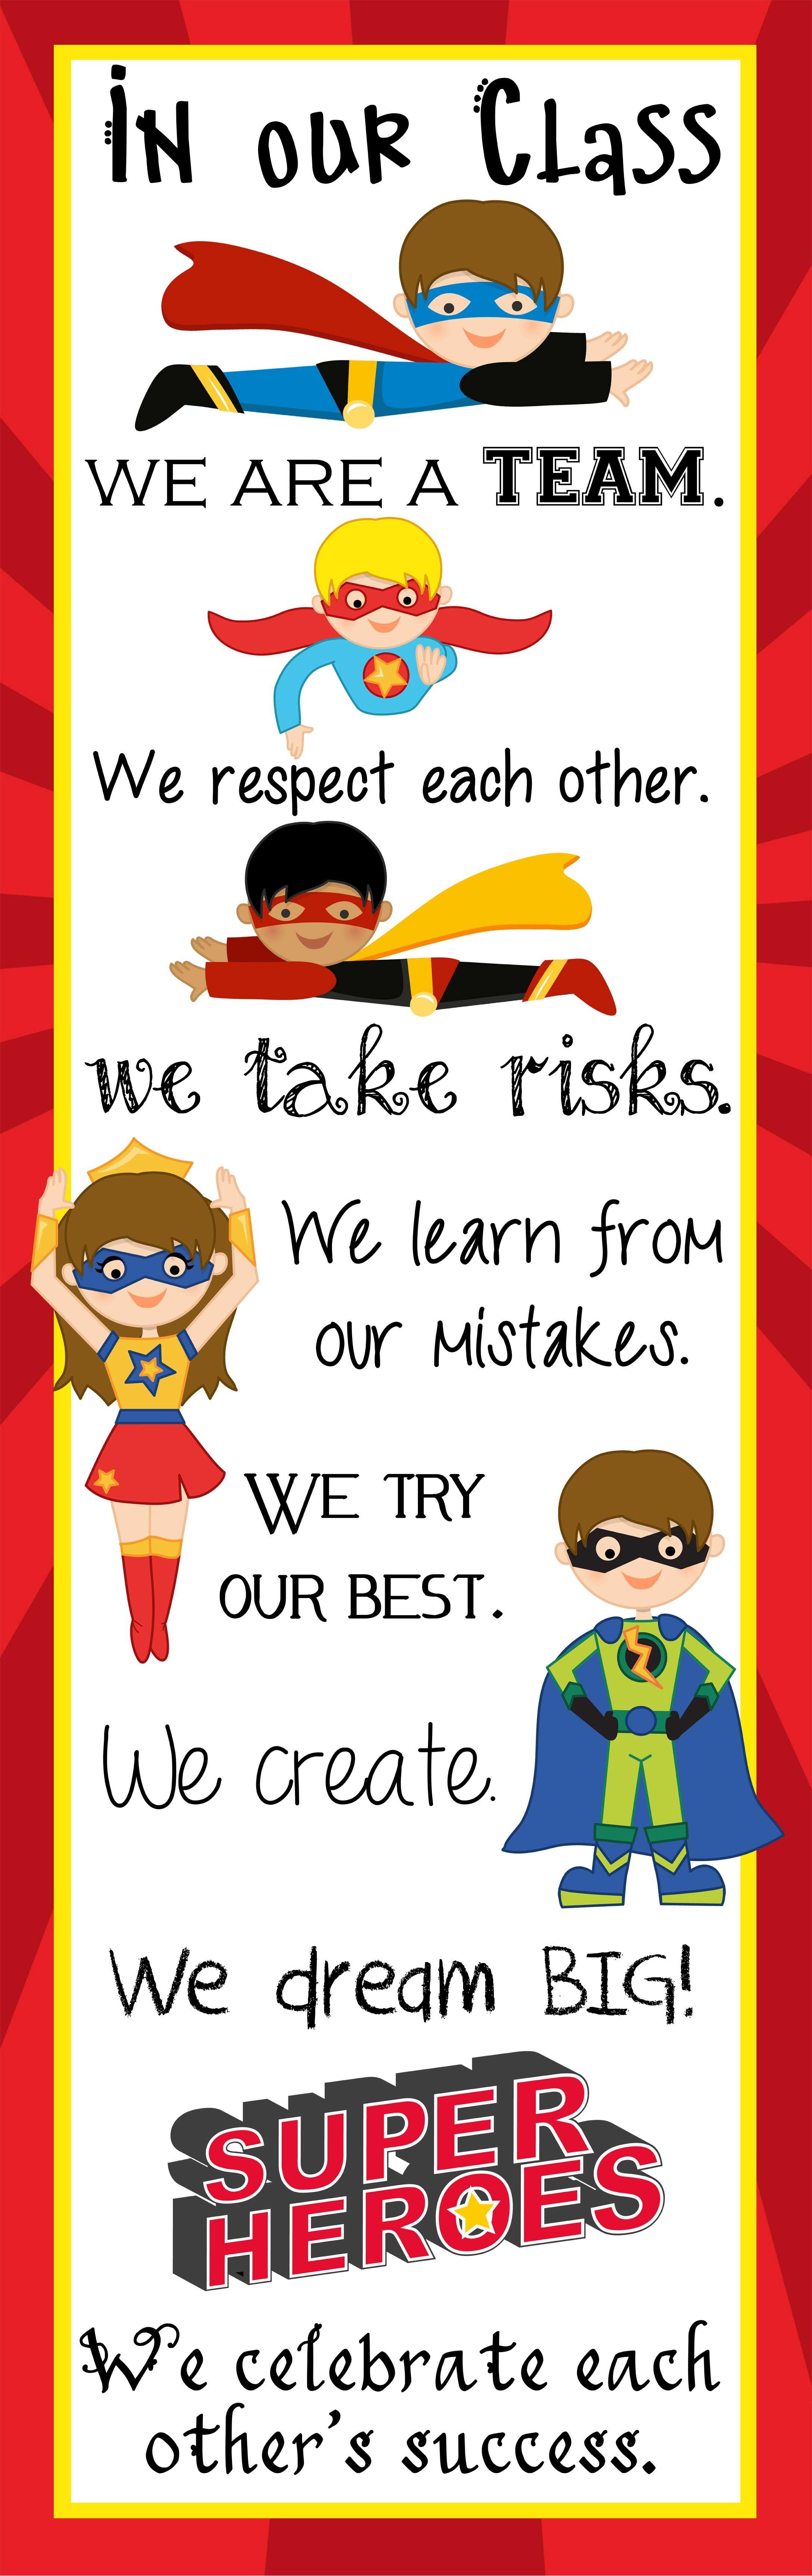 Classroom Decor Superhero : Superhero super improver wall free classroom